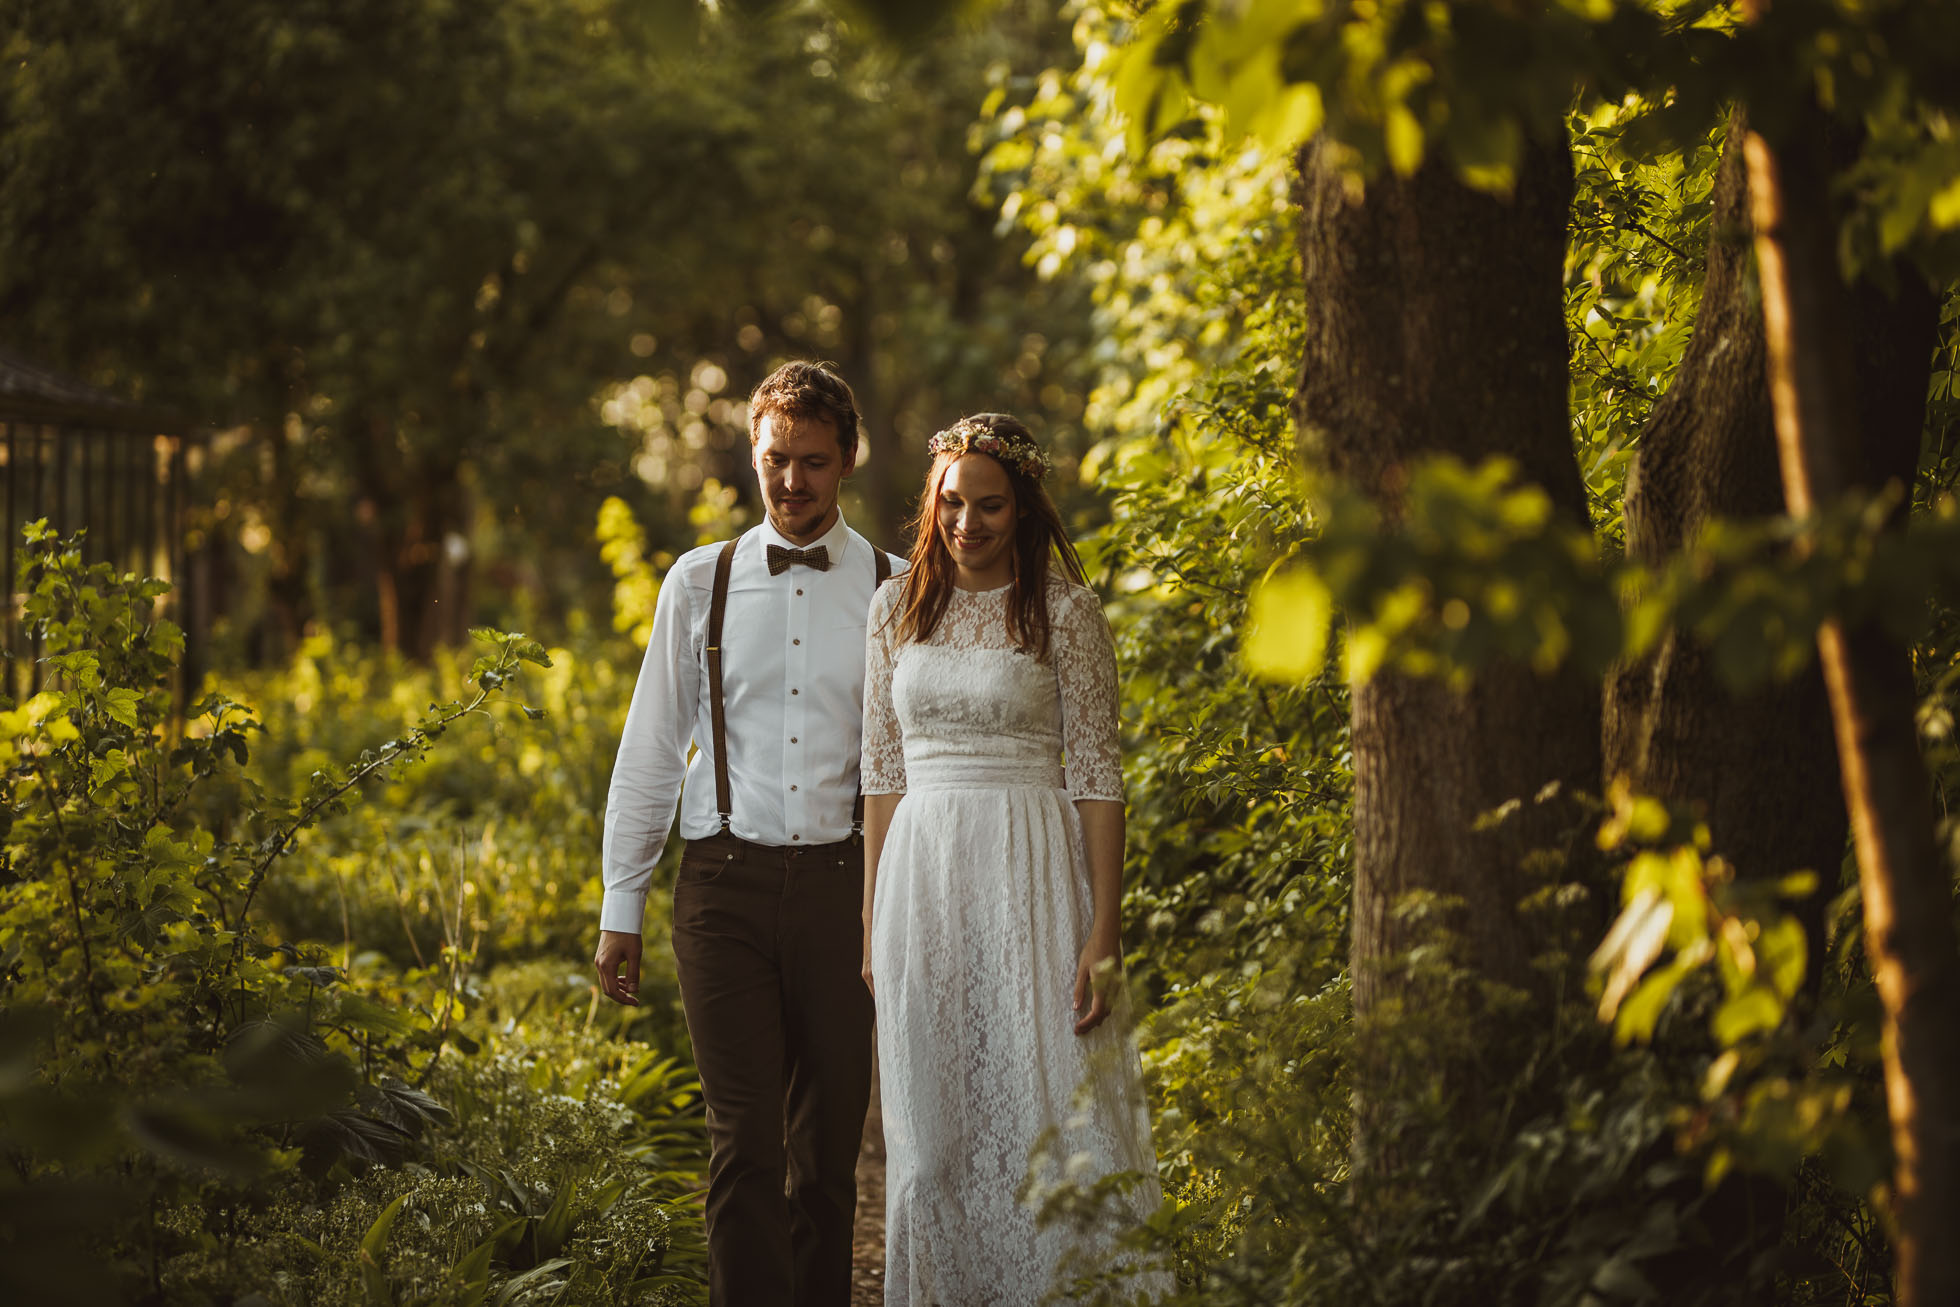 utrecht-wedding-photographer-131.jpg